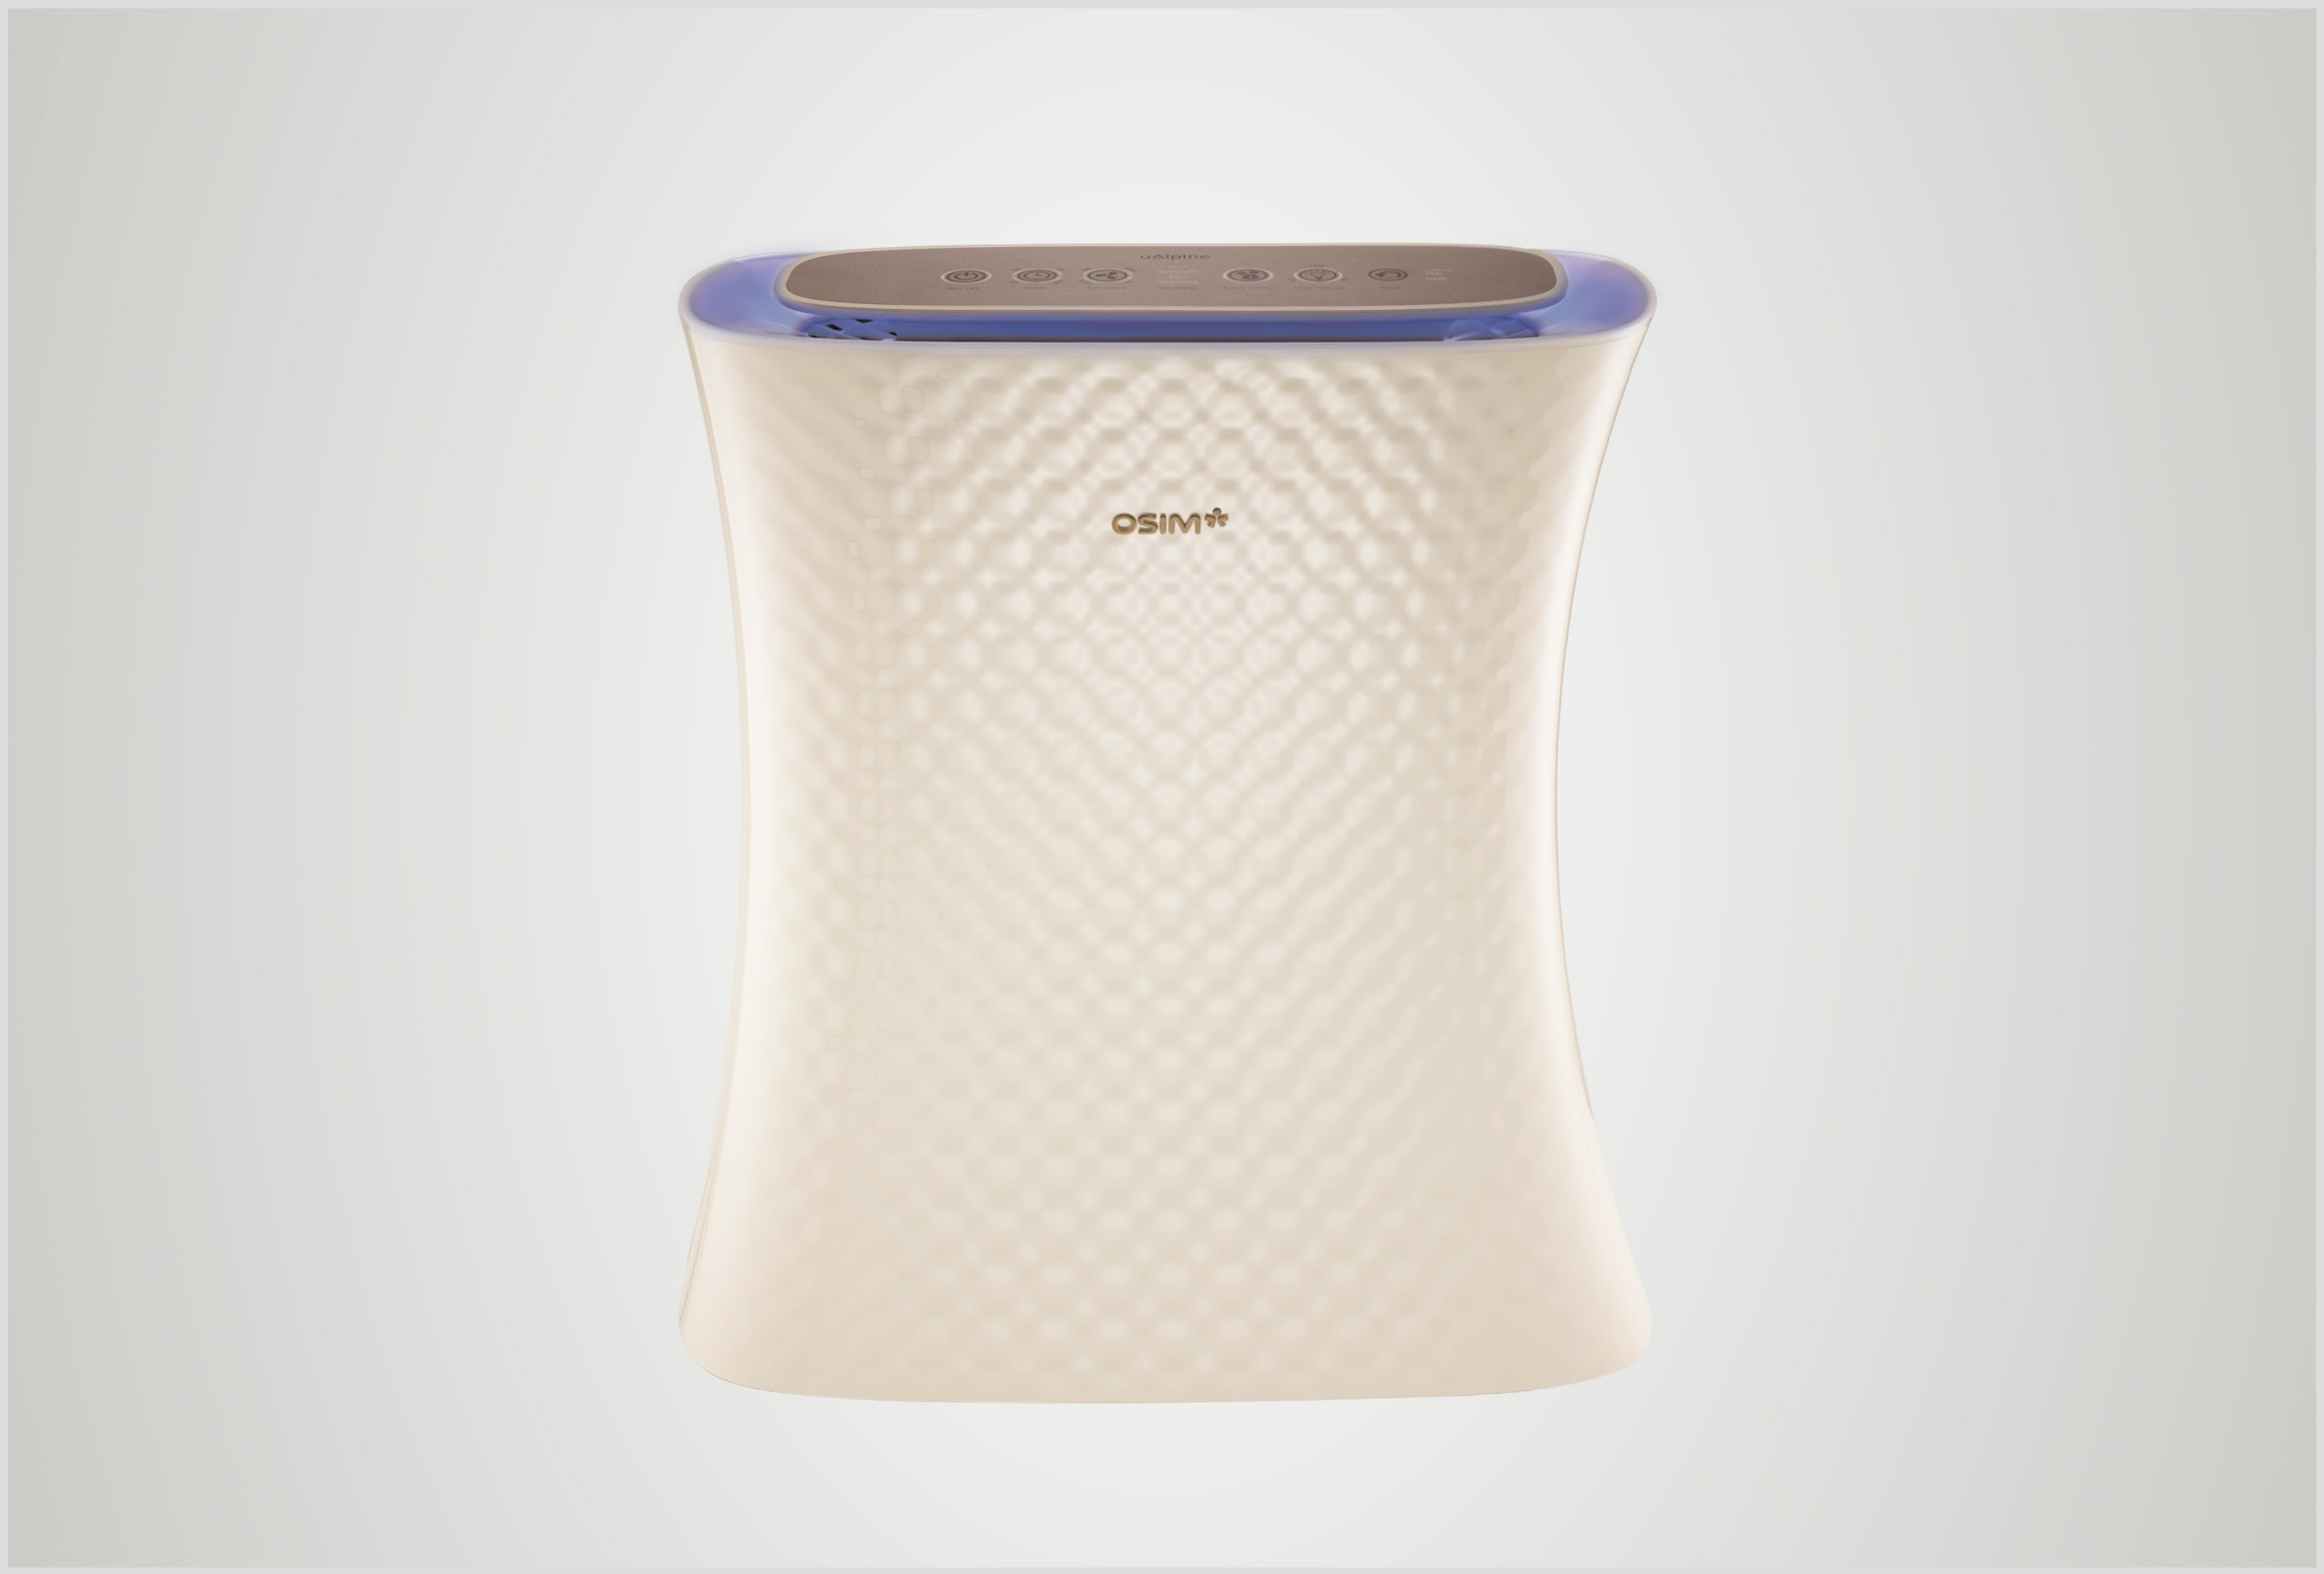 uAlpine Air Purifier